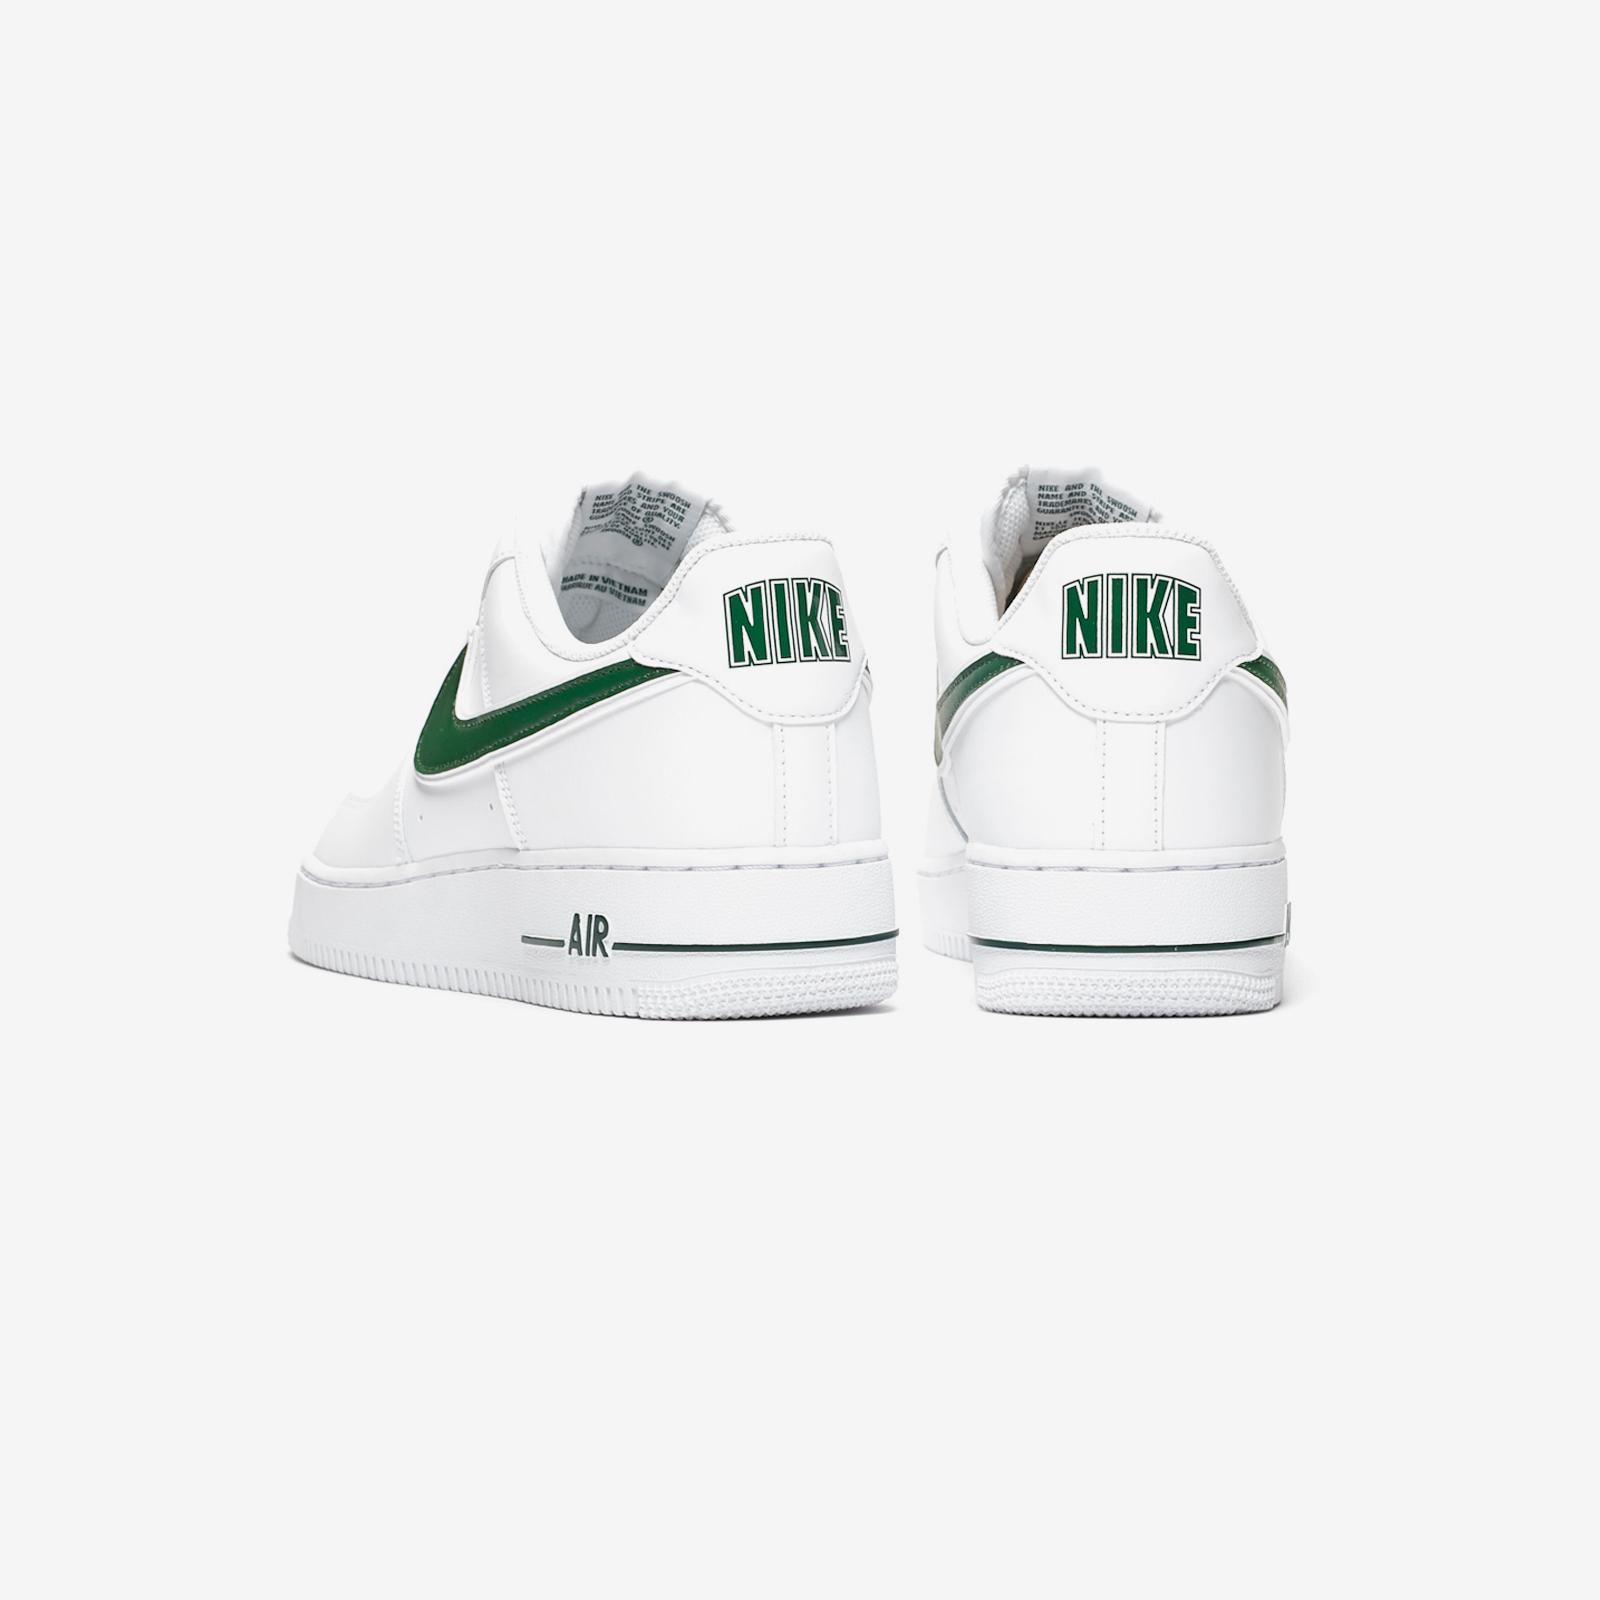 sports shoes 8a7b1 a99f3 Nike Air Force 1 07 - Ao2423-104 - Sneakersnstuff   sneakers   streetwear  online since 1999